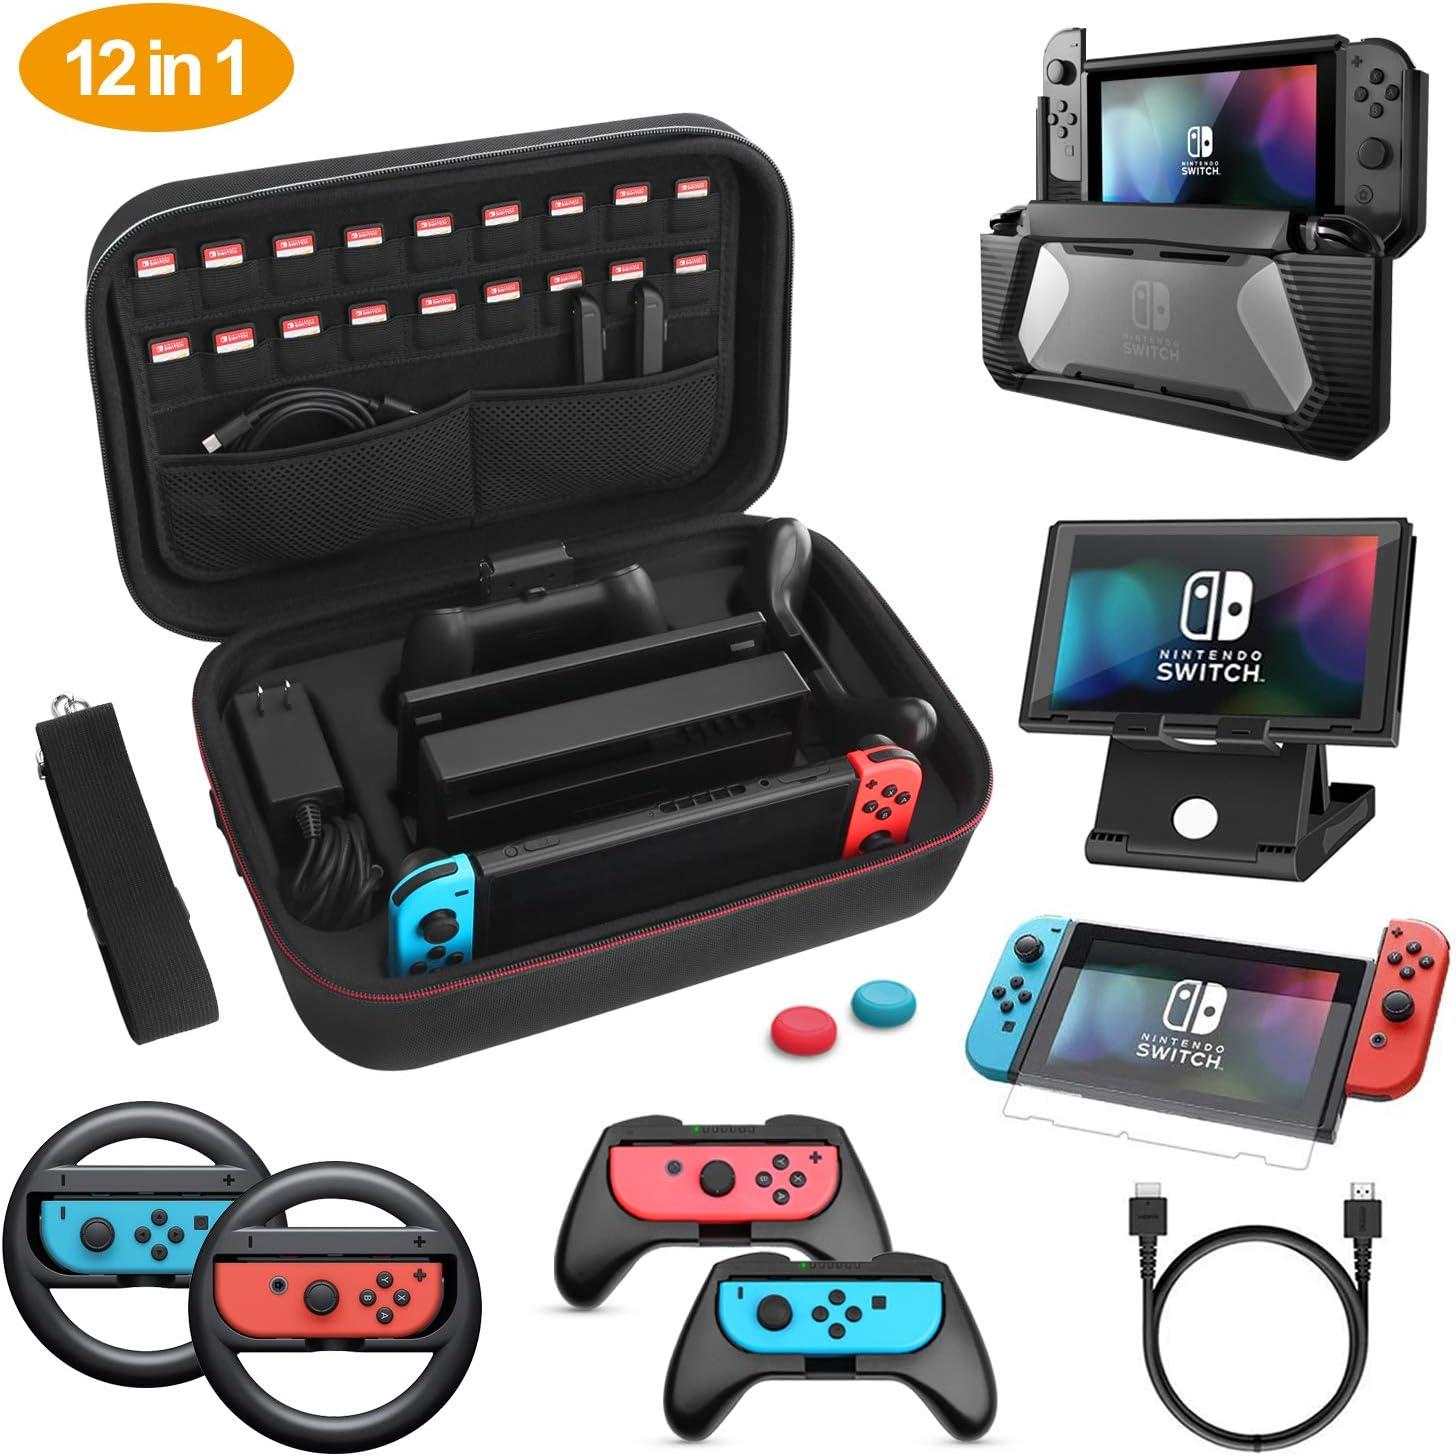 Kit Todo en 1 Nintendo Switch